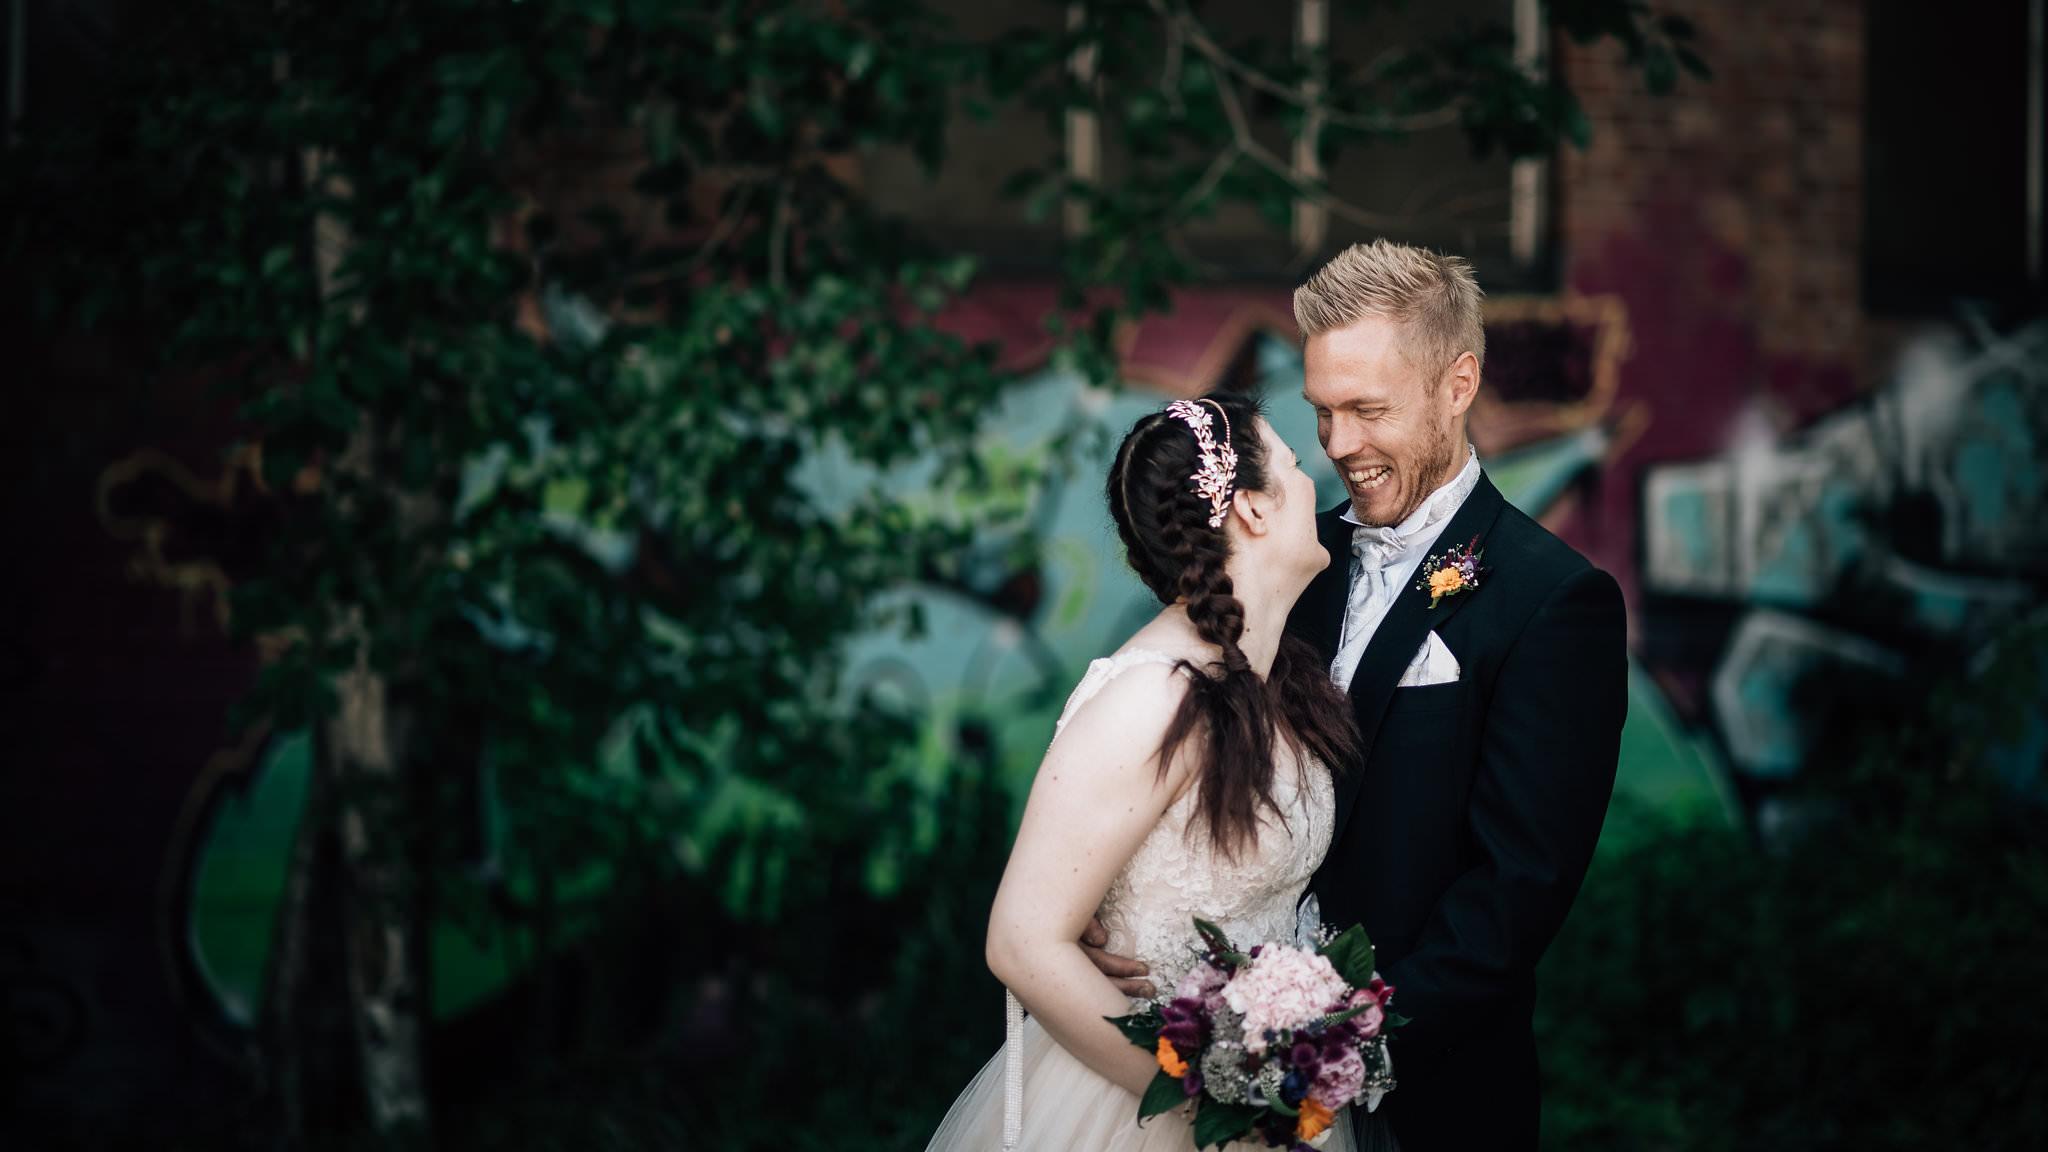 _N859985-fotograf-vestfold-bryllupsfotograf-.jpg